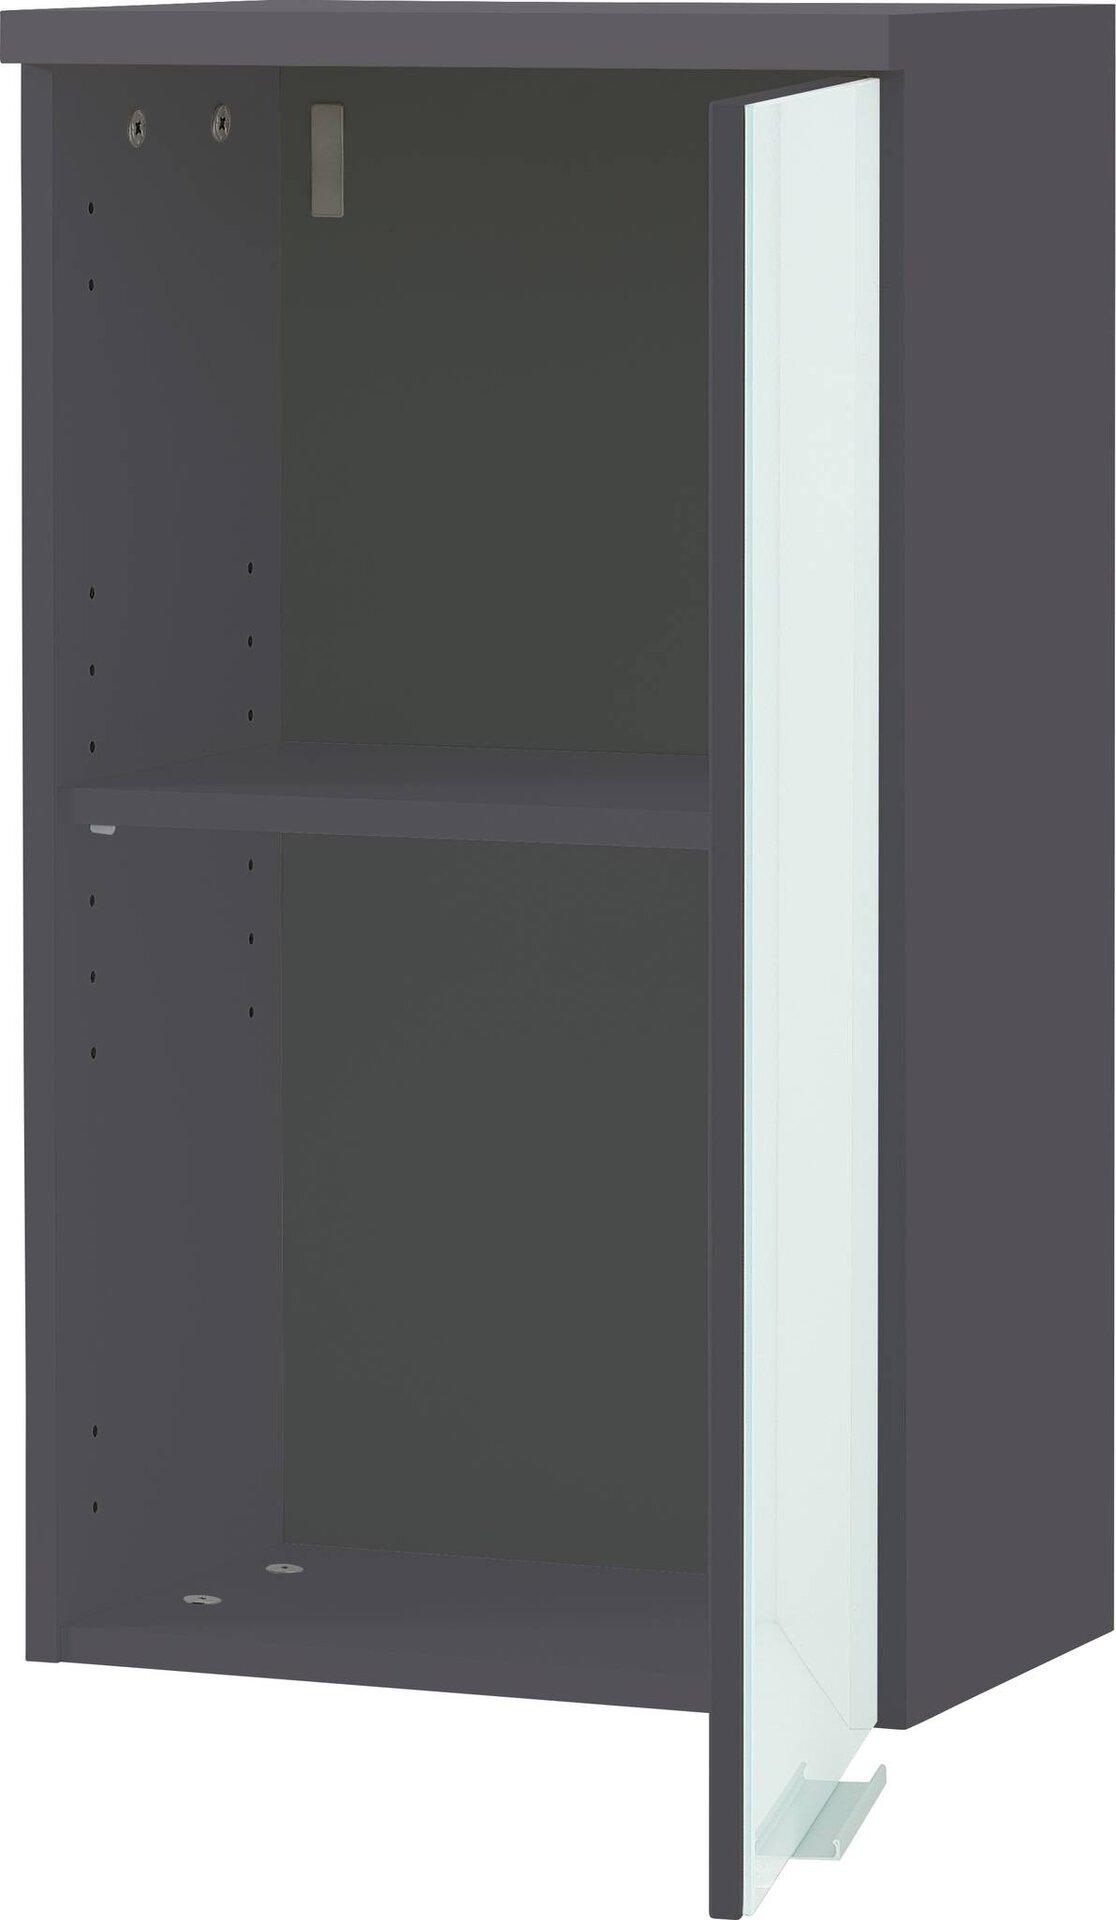 Hängeschrank GW-PESCARA Germania Metall 27 x 69 x 39 cm